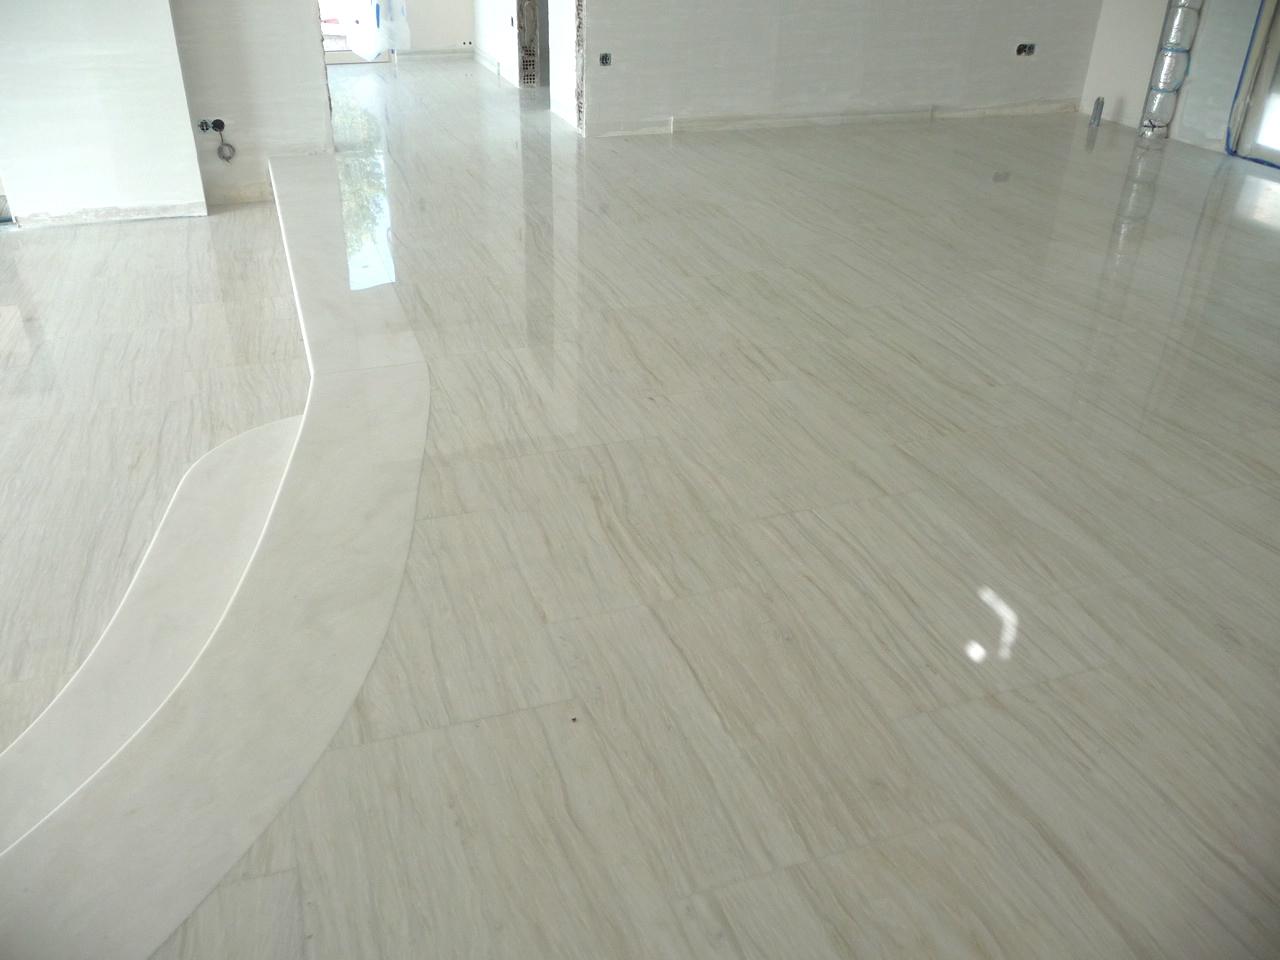 Wit marmer aphrodite marble centre natuurstenen vloer leverancier marmer graniet flagstones - Luxe marmer ...